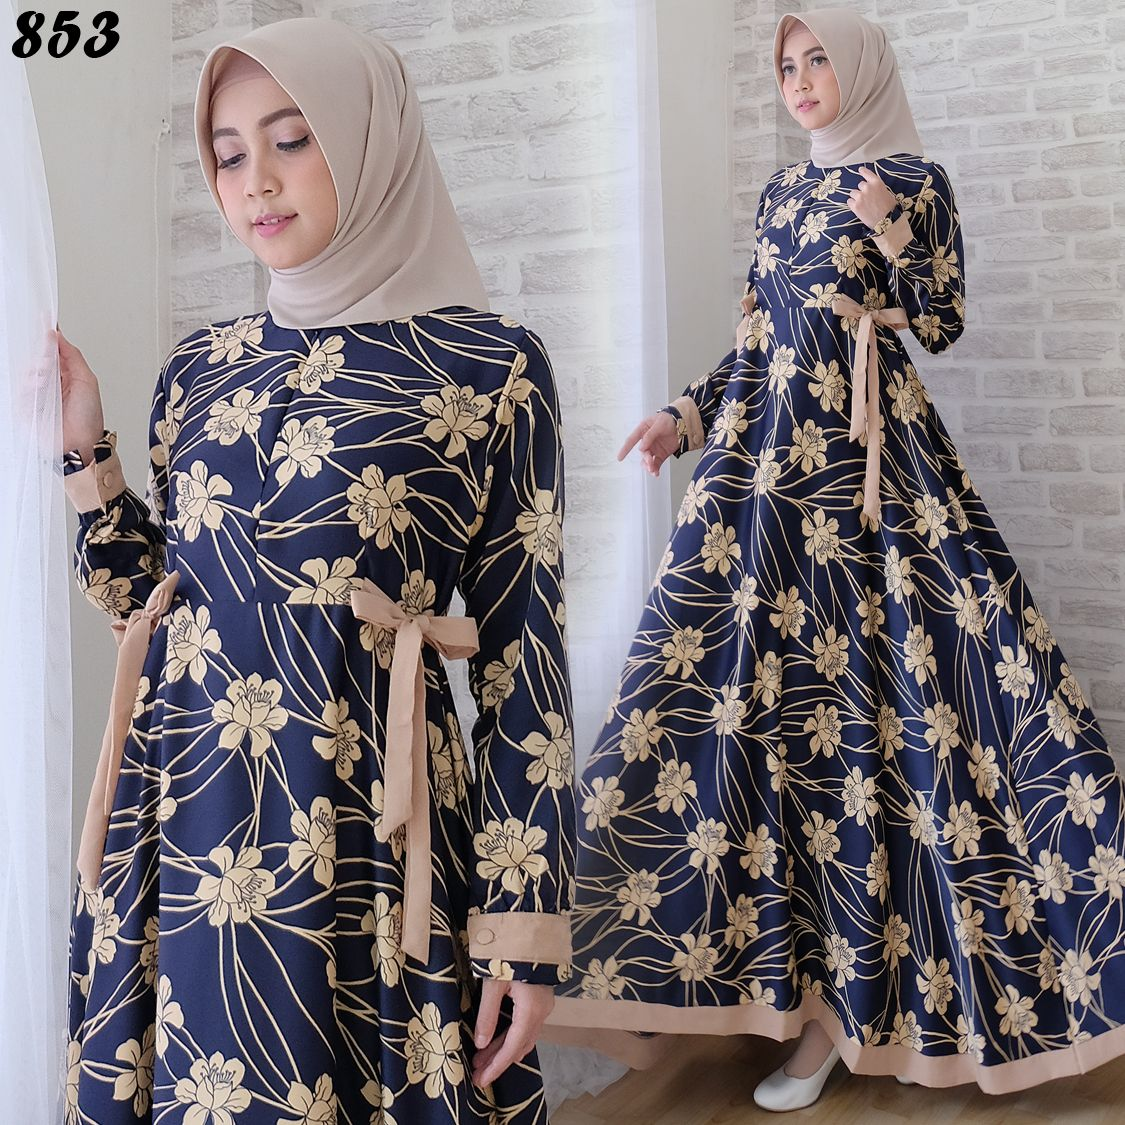 Gamis Cantik Maxmara Bunga C10  Baju Muslim Modern - Butik Jingga